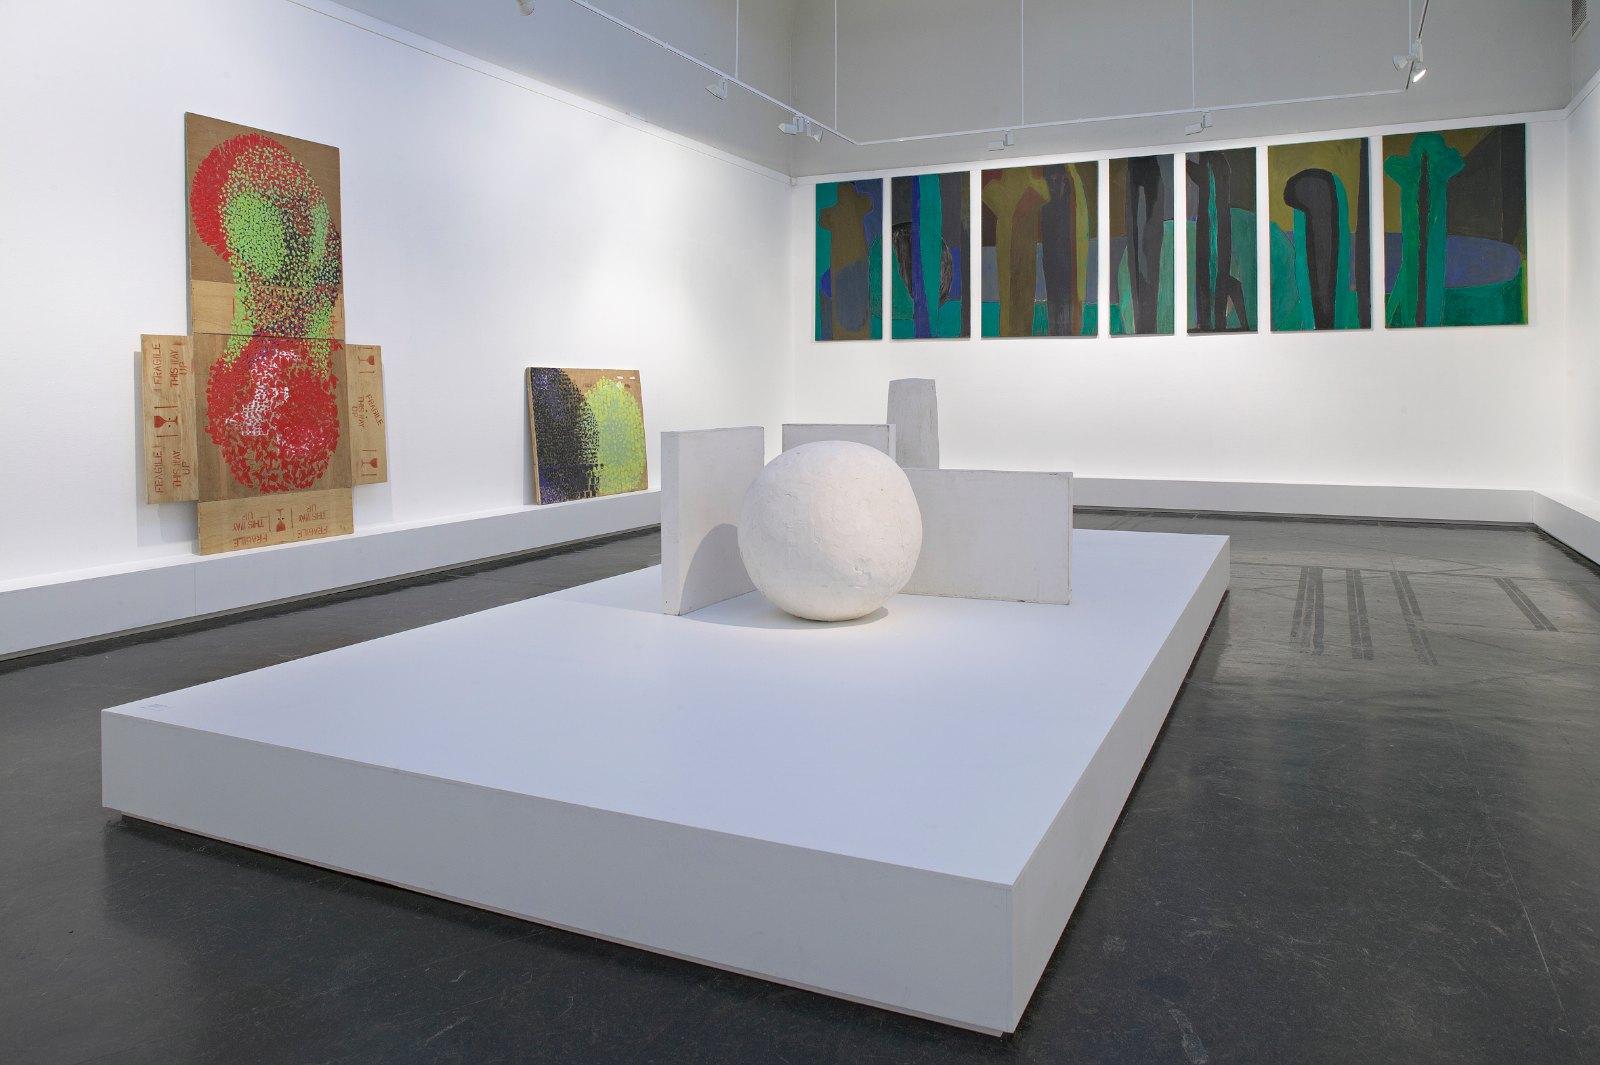 Figuren 1-7 (Kartoffelserien), 1986, tempera on canvas, size variable, 7 parts. Installation view Kunstnernes Hus, 2006